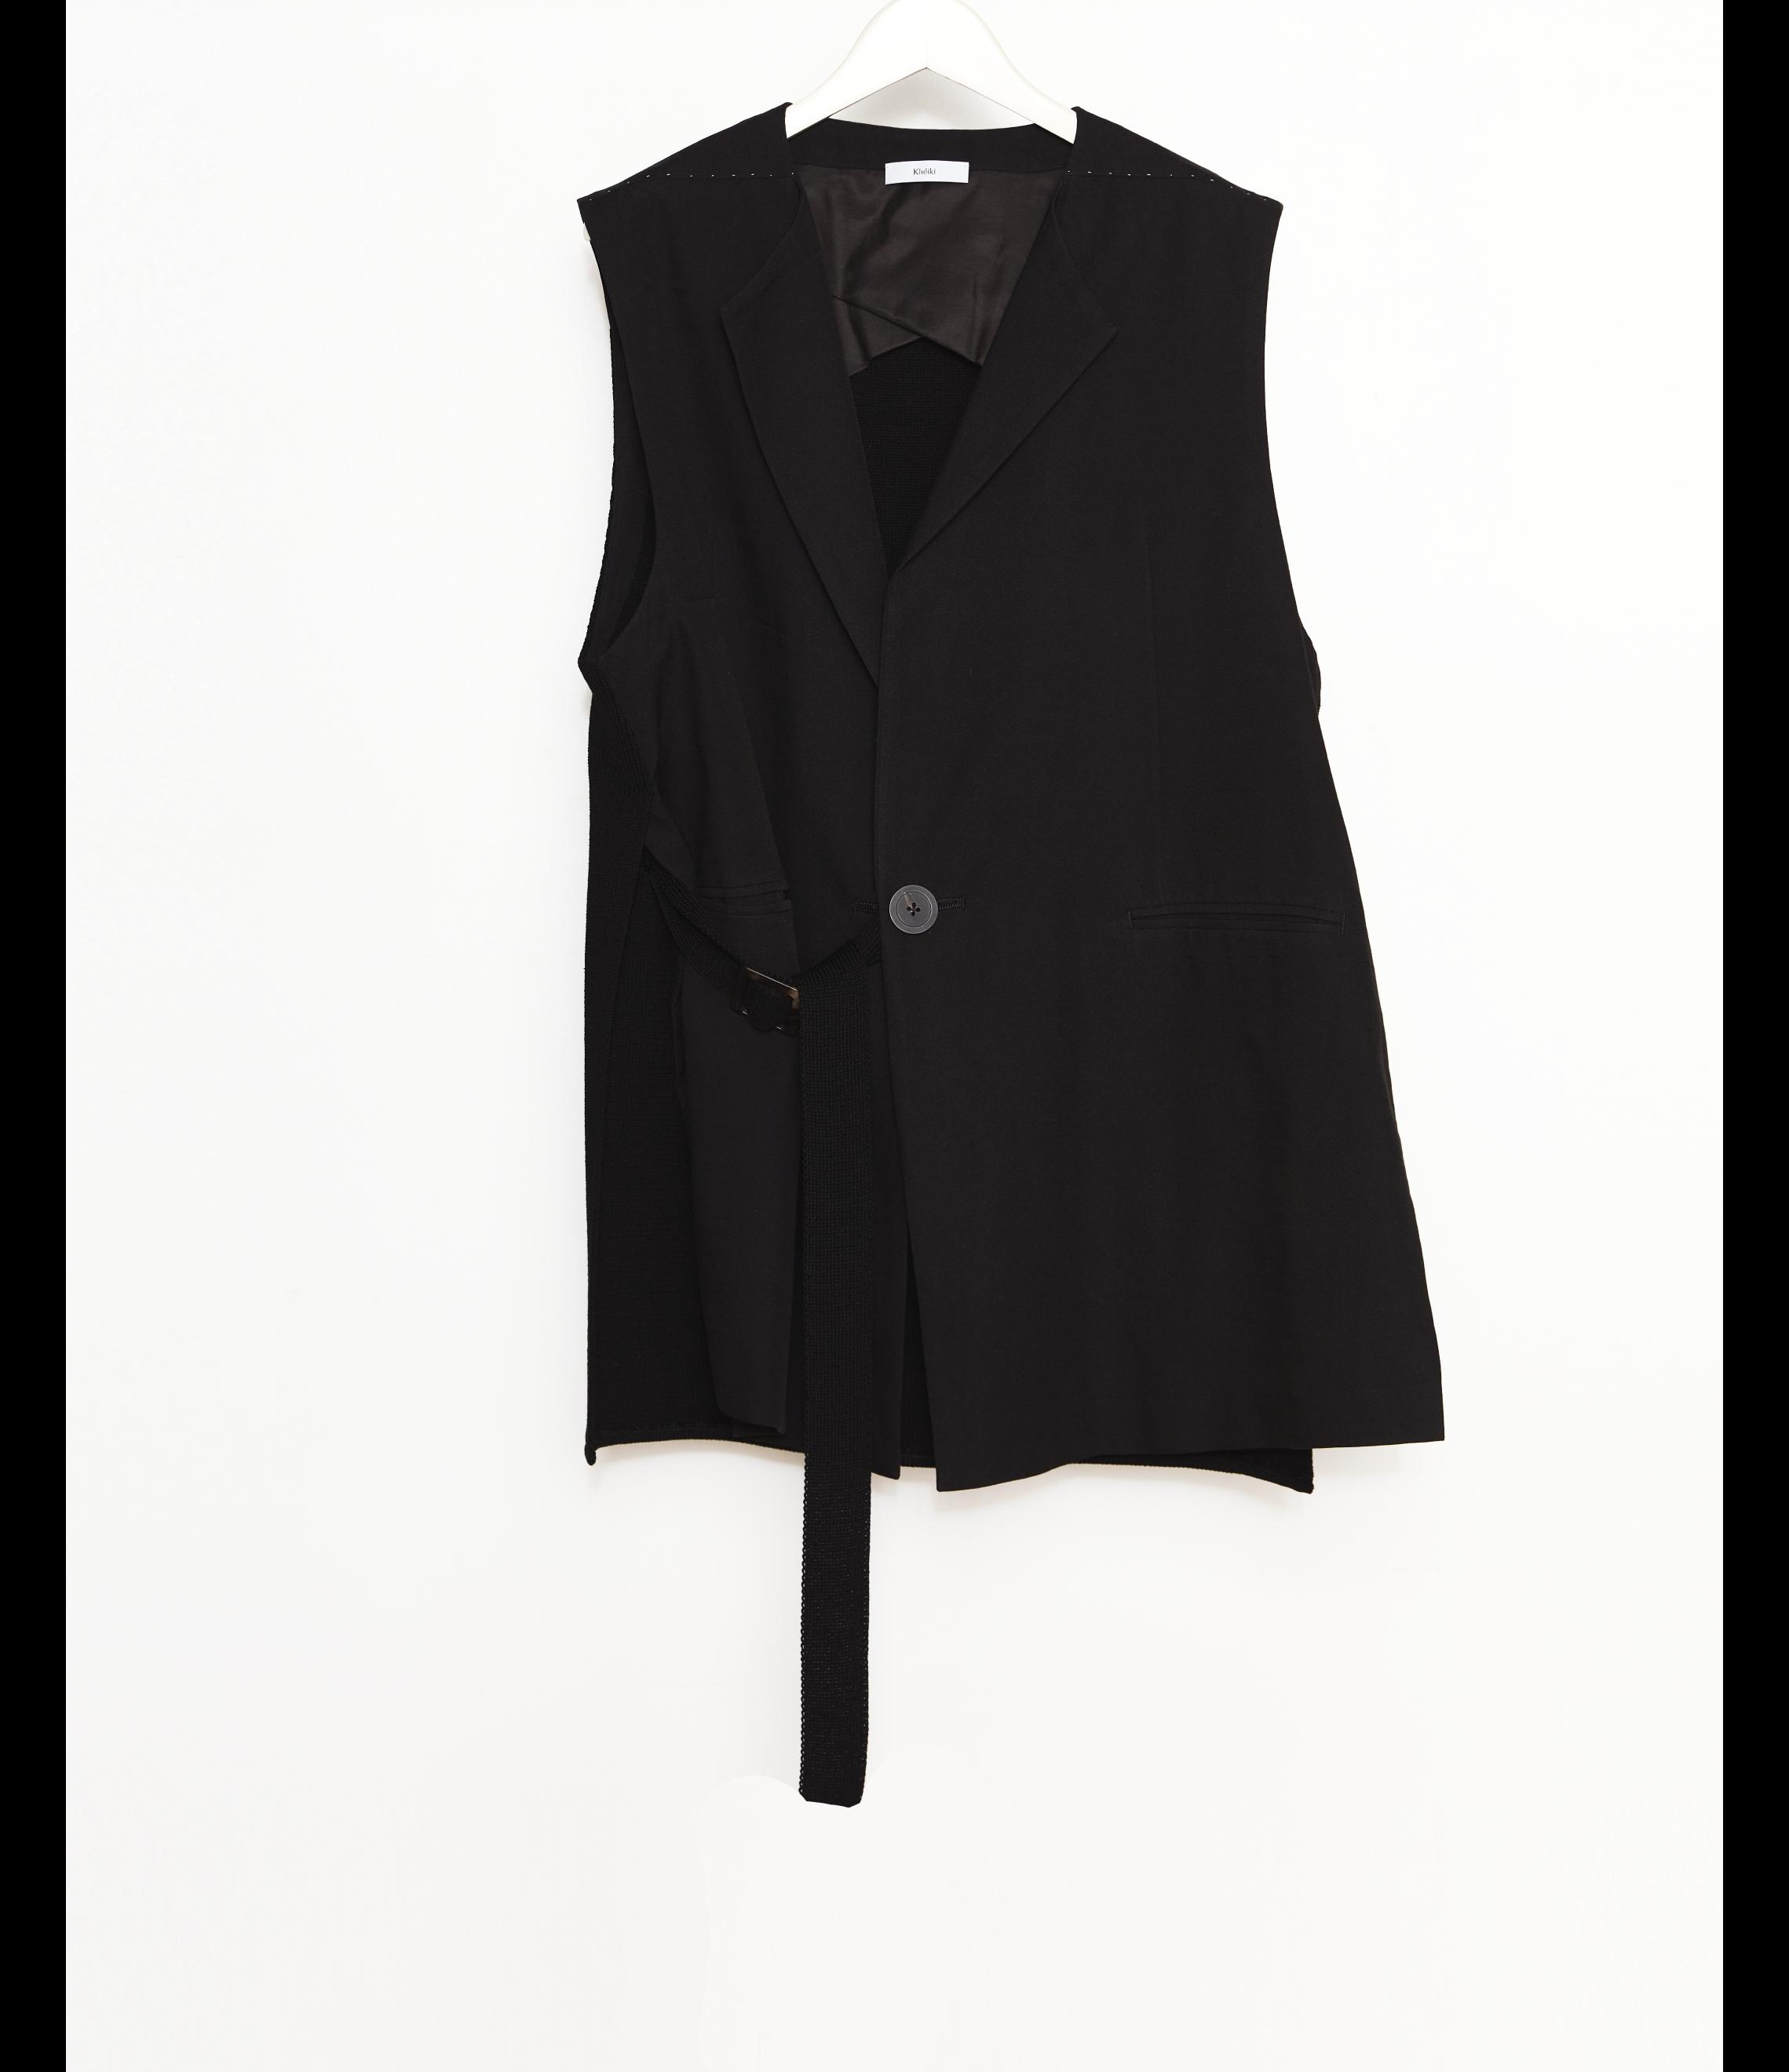 No Sleeve Jacket / Black